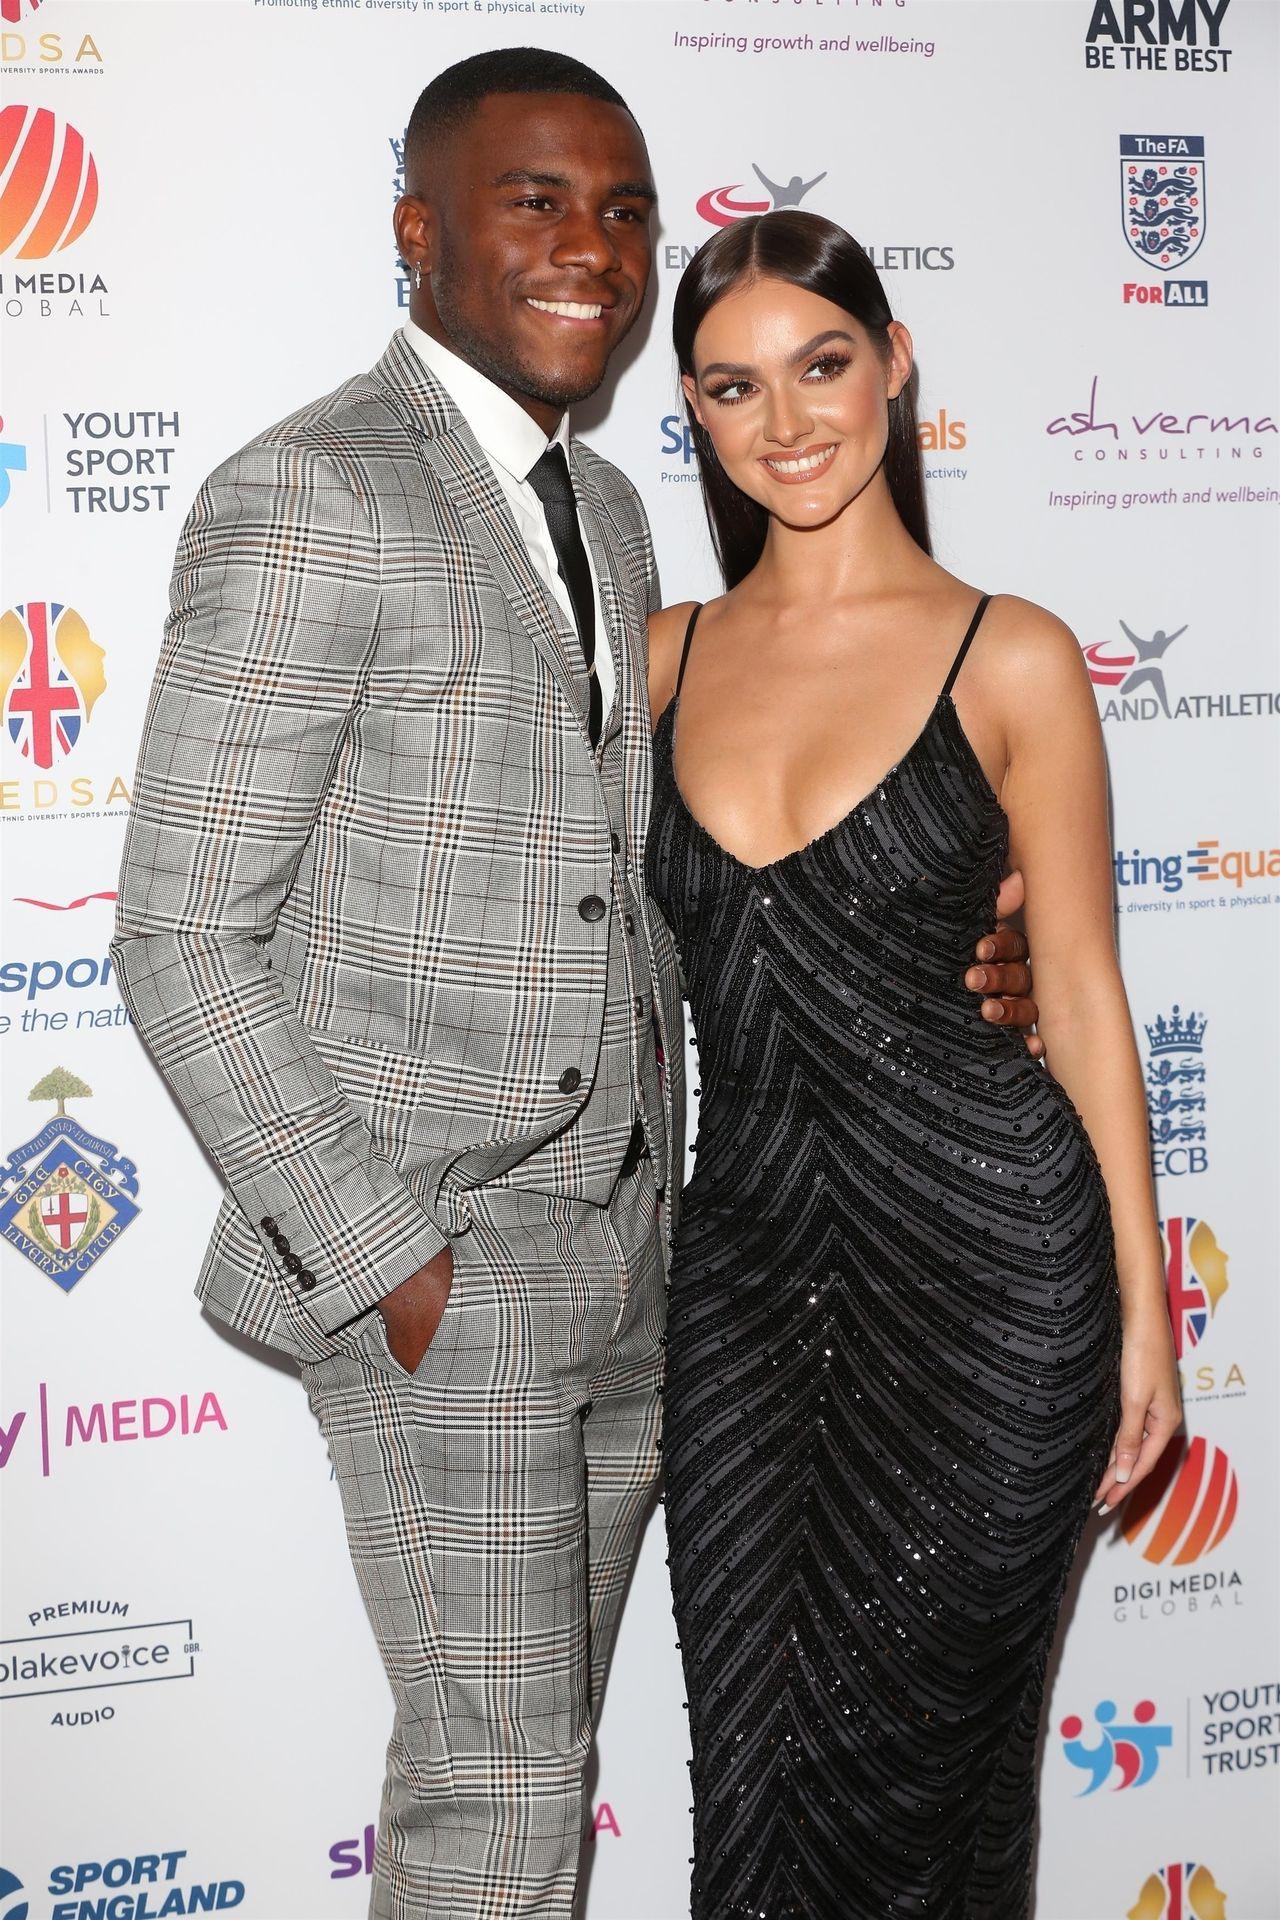 Siannise Fudge & Luke Trotman Are Seen At British Ethnic Diversity Sports Awards 0050